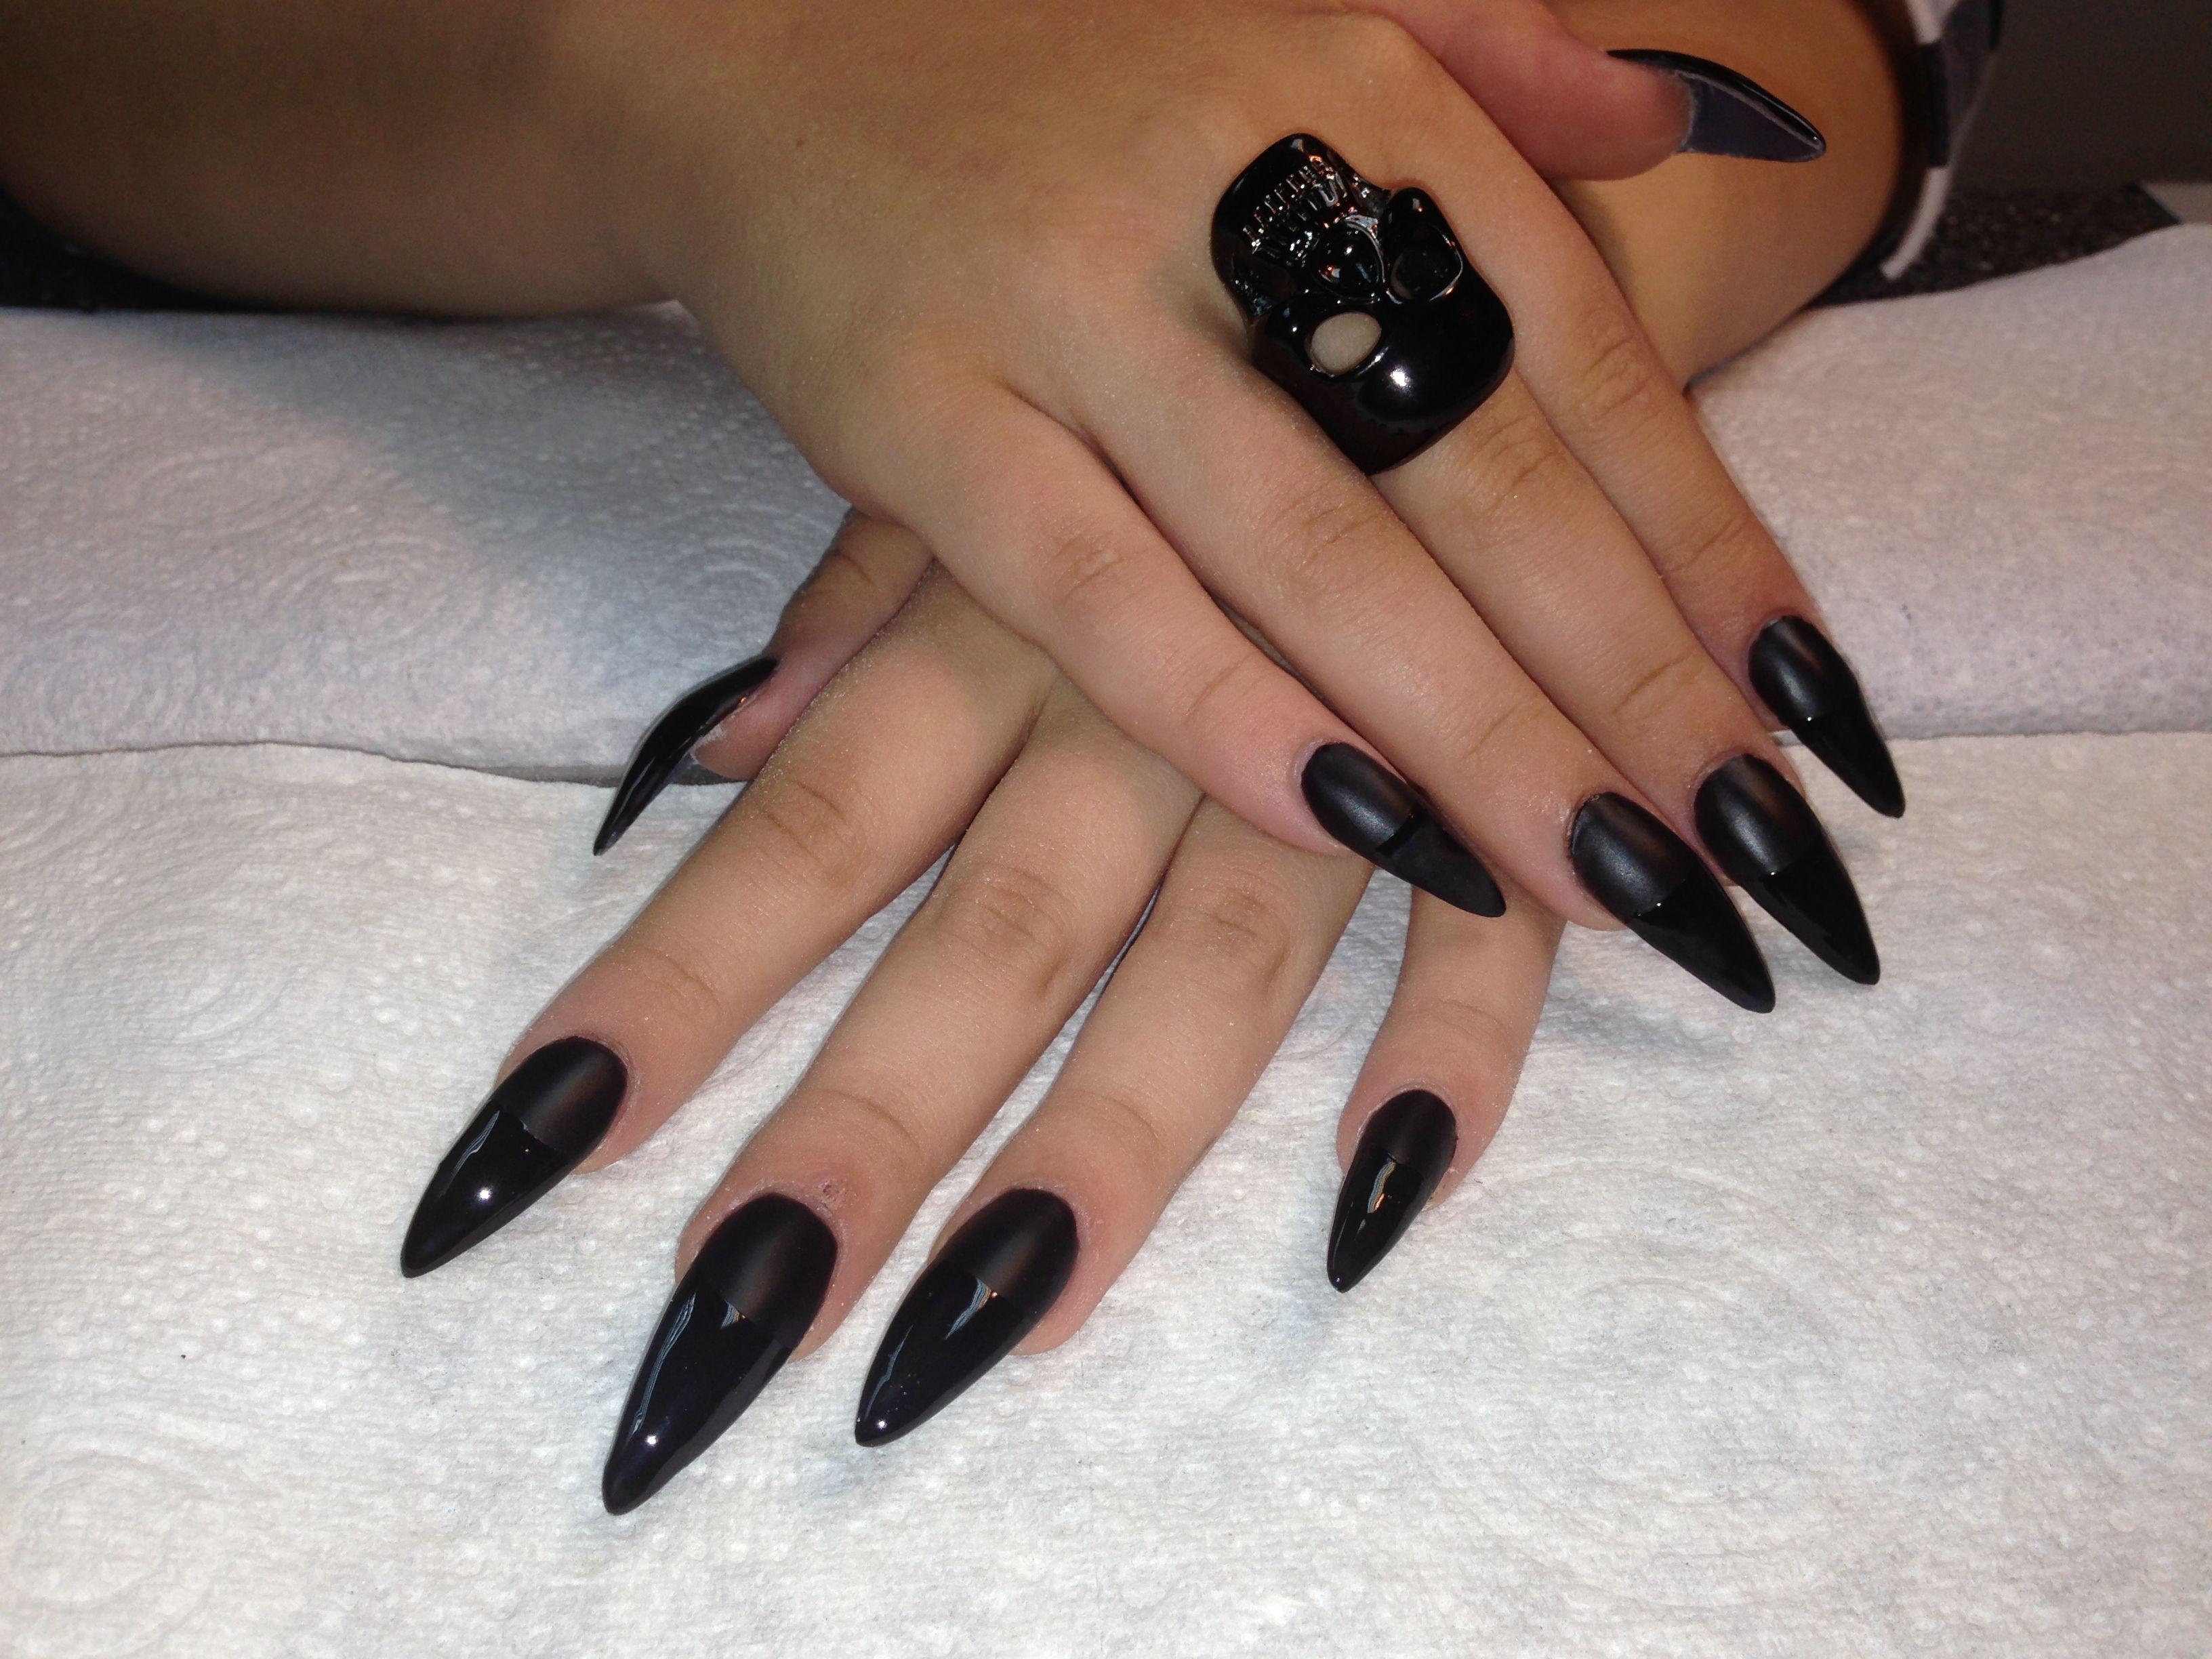 Matt black and pointy tip nails | Halloween nails